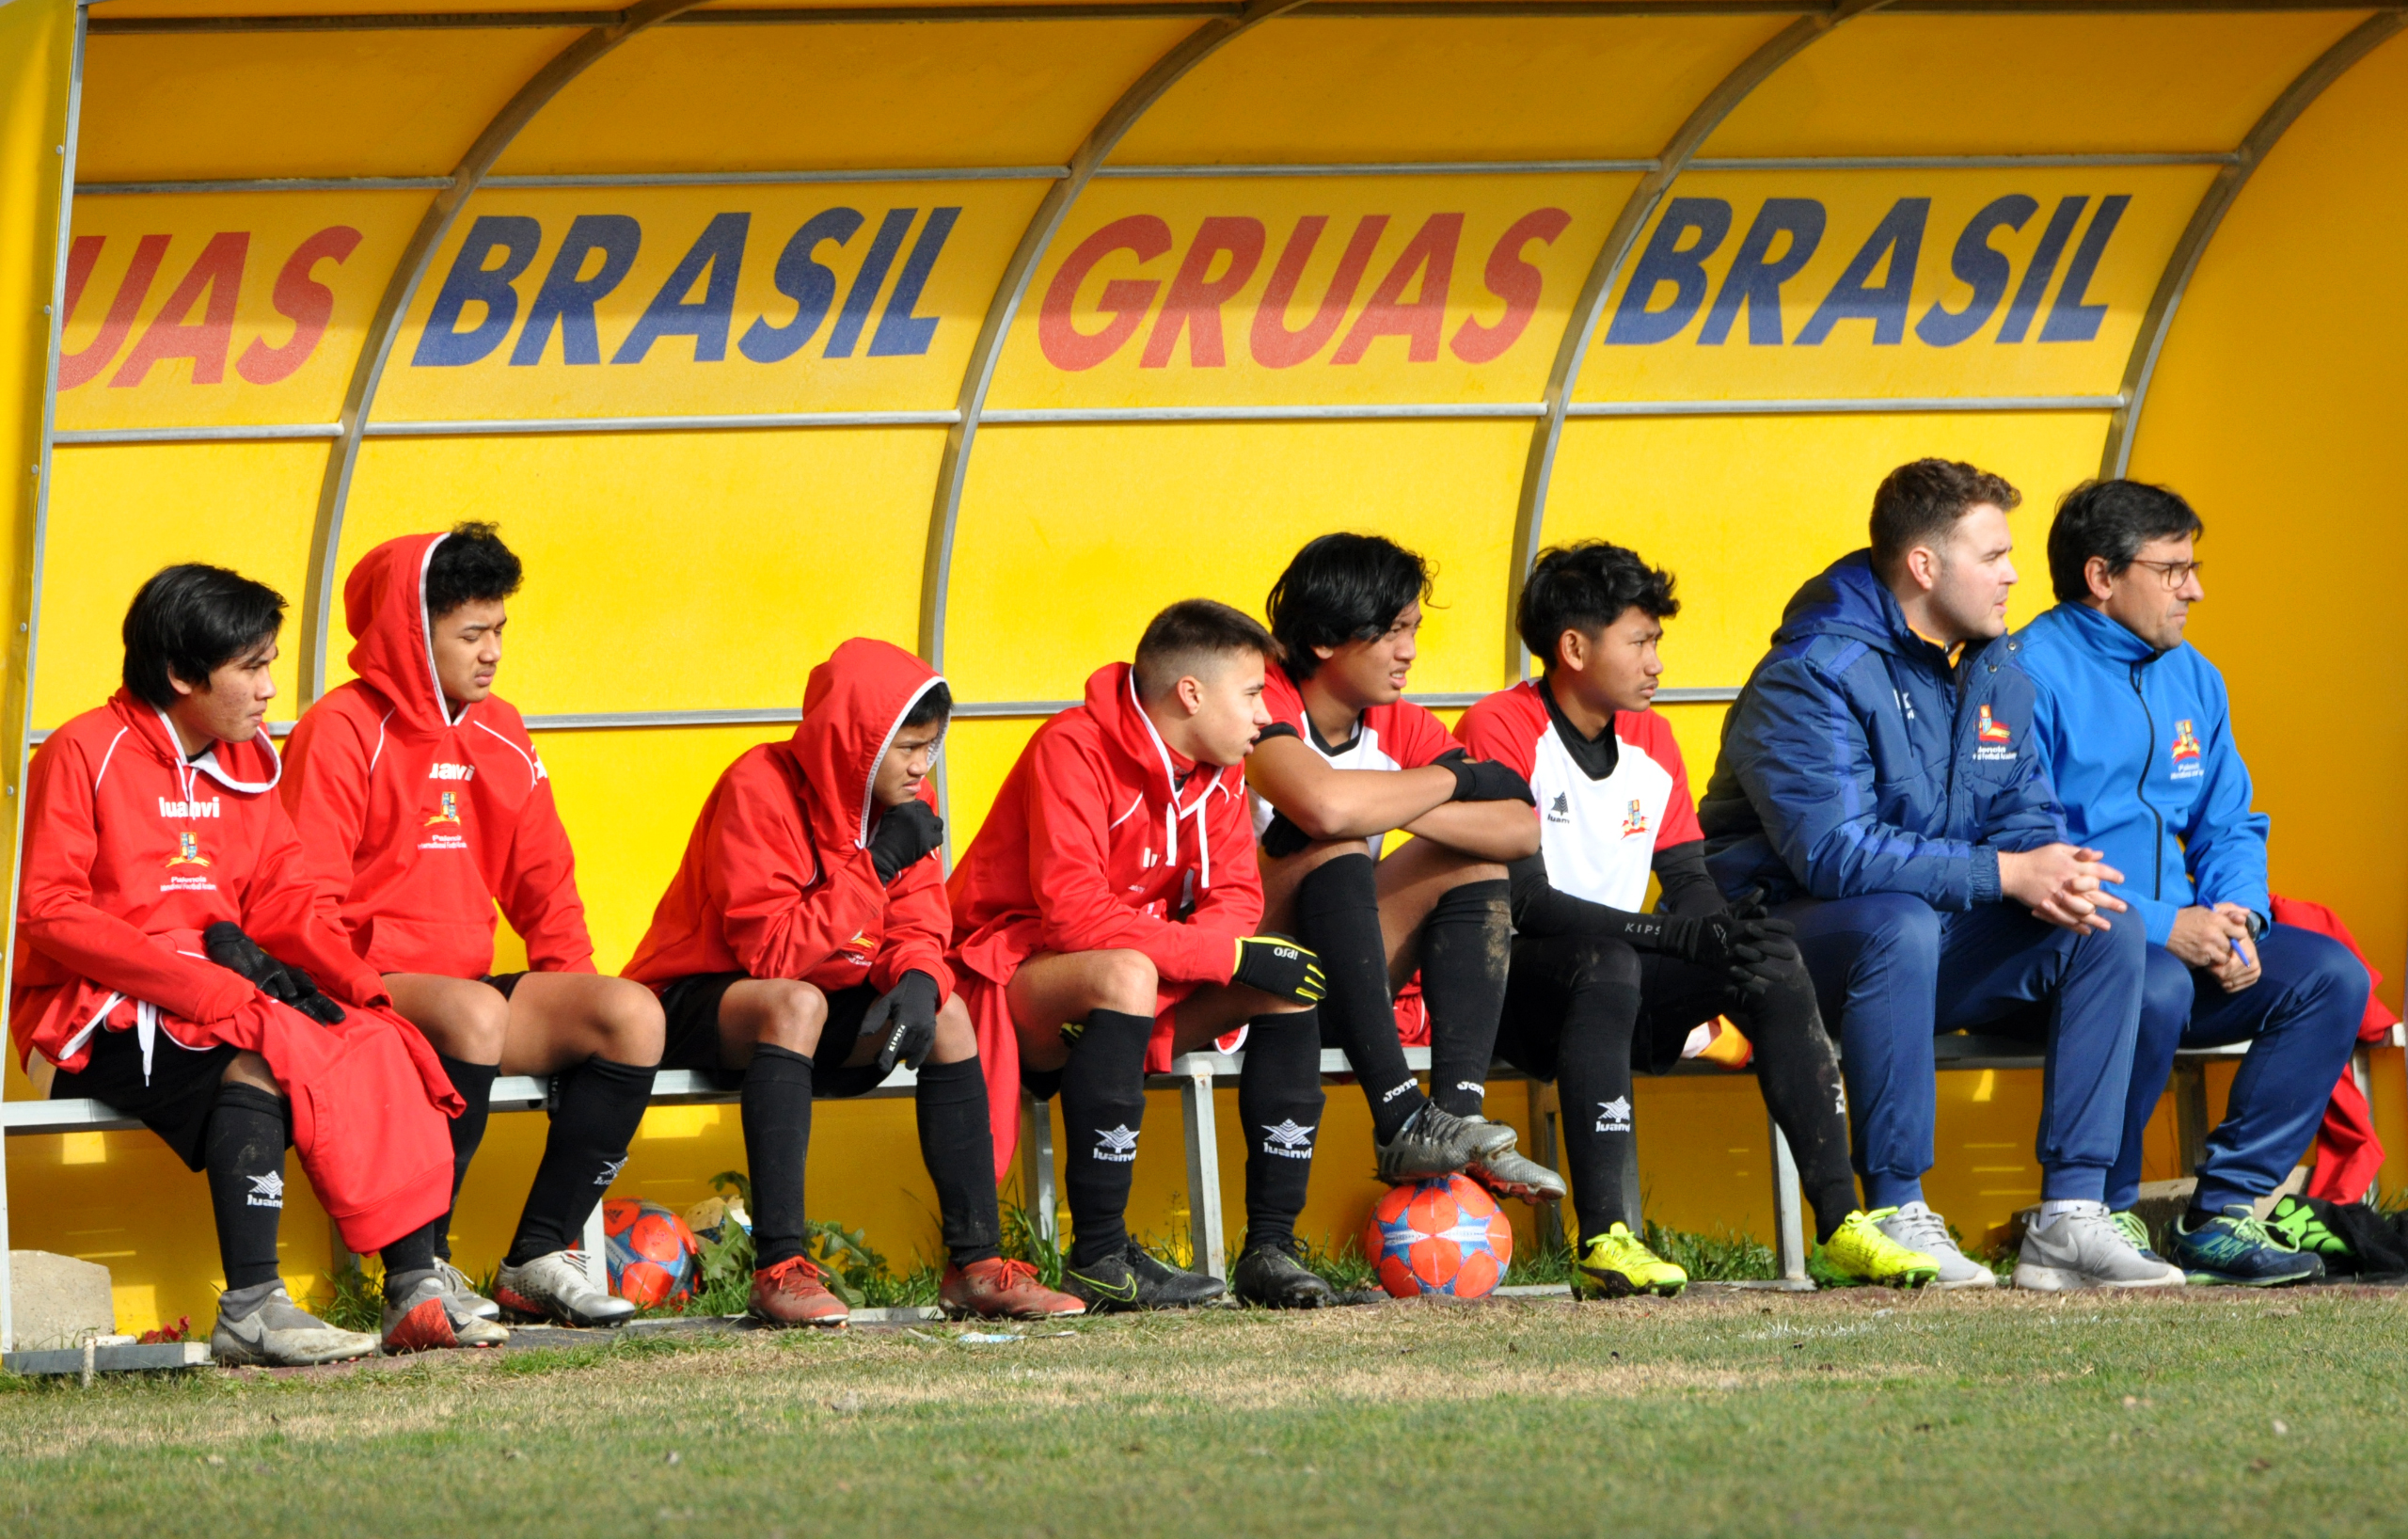 https://palenciafootballacademy.com/wp-content/uploads/2020/02/foto-web.jpg